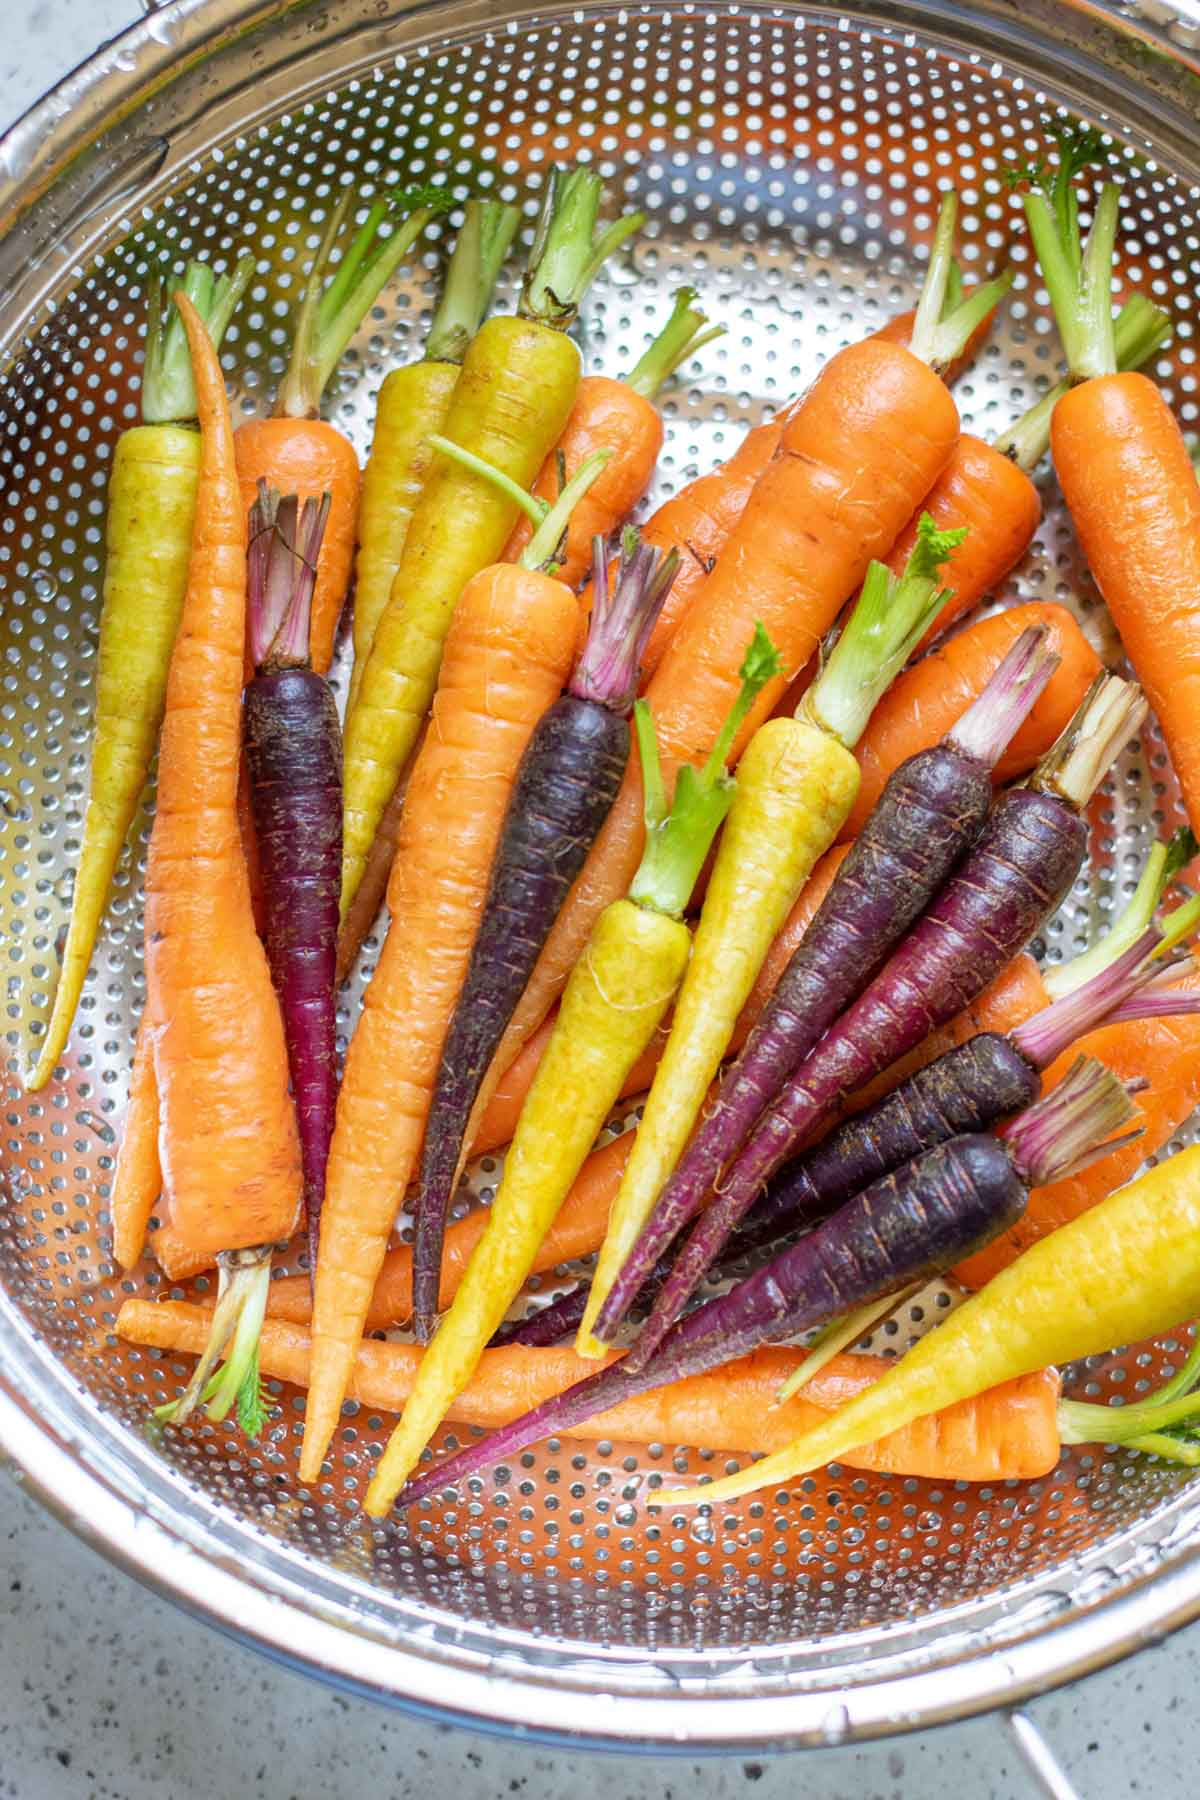 Rainbow carrots in a metal collander